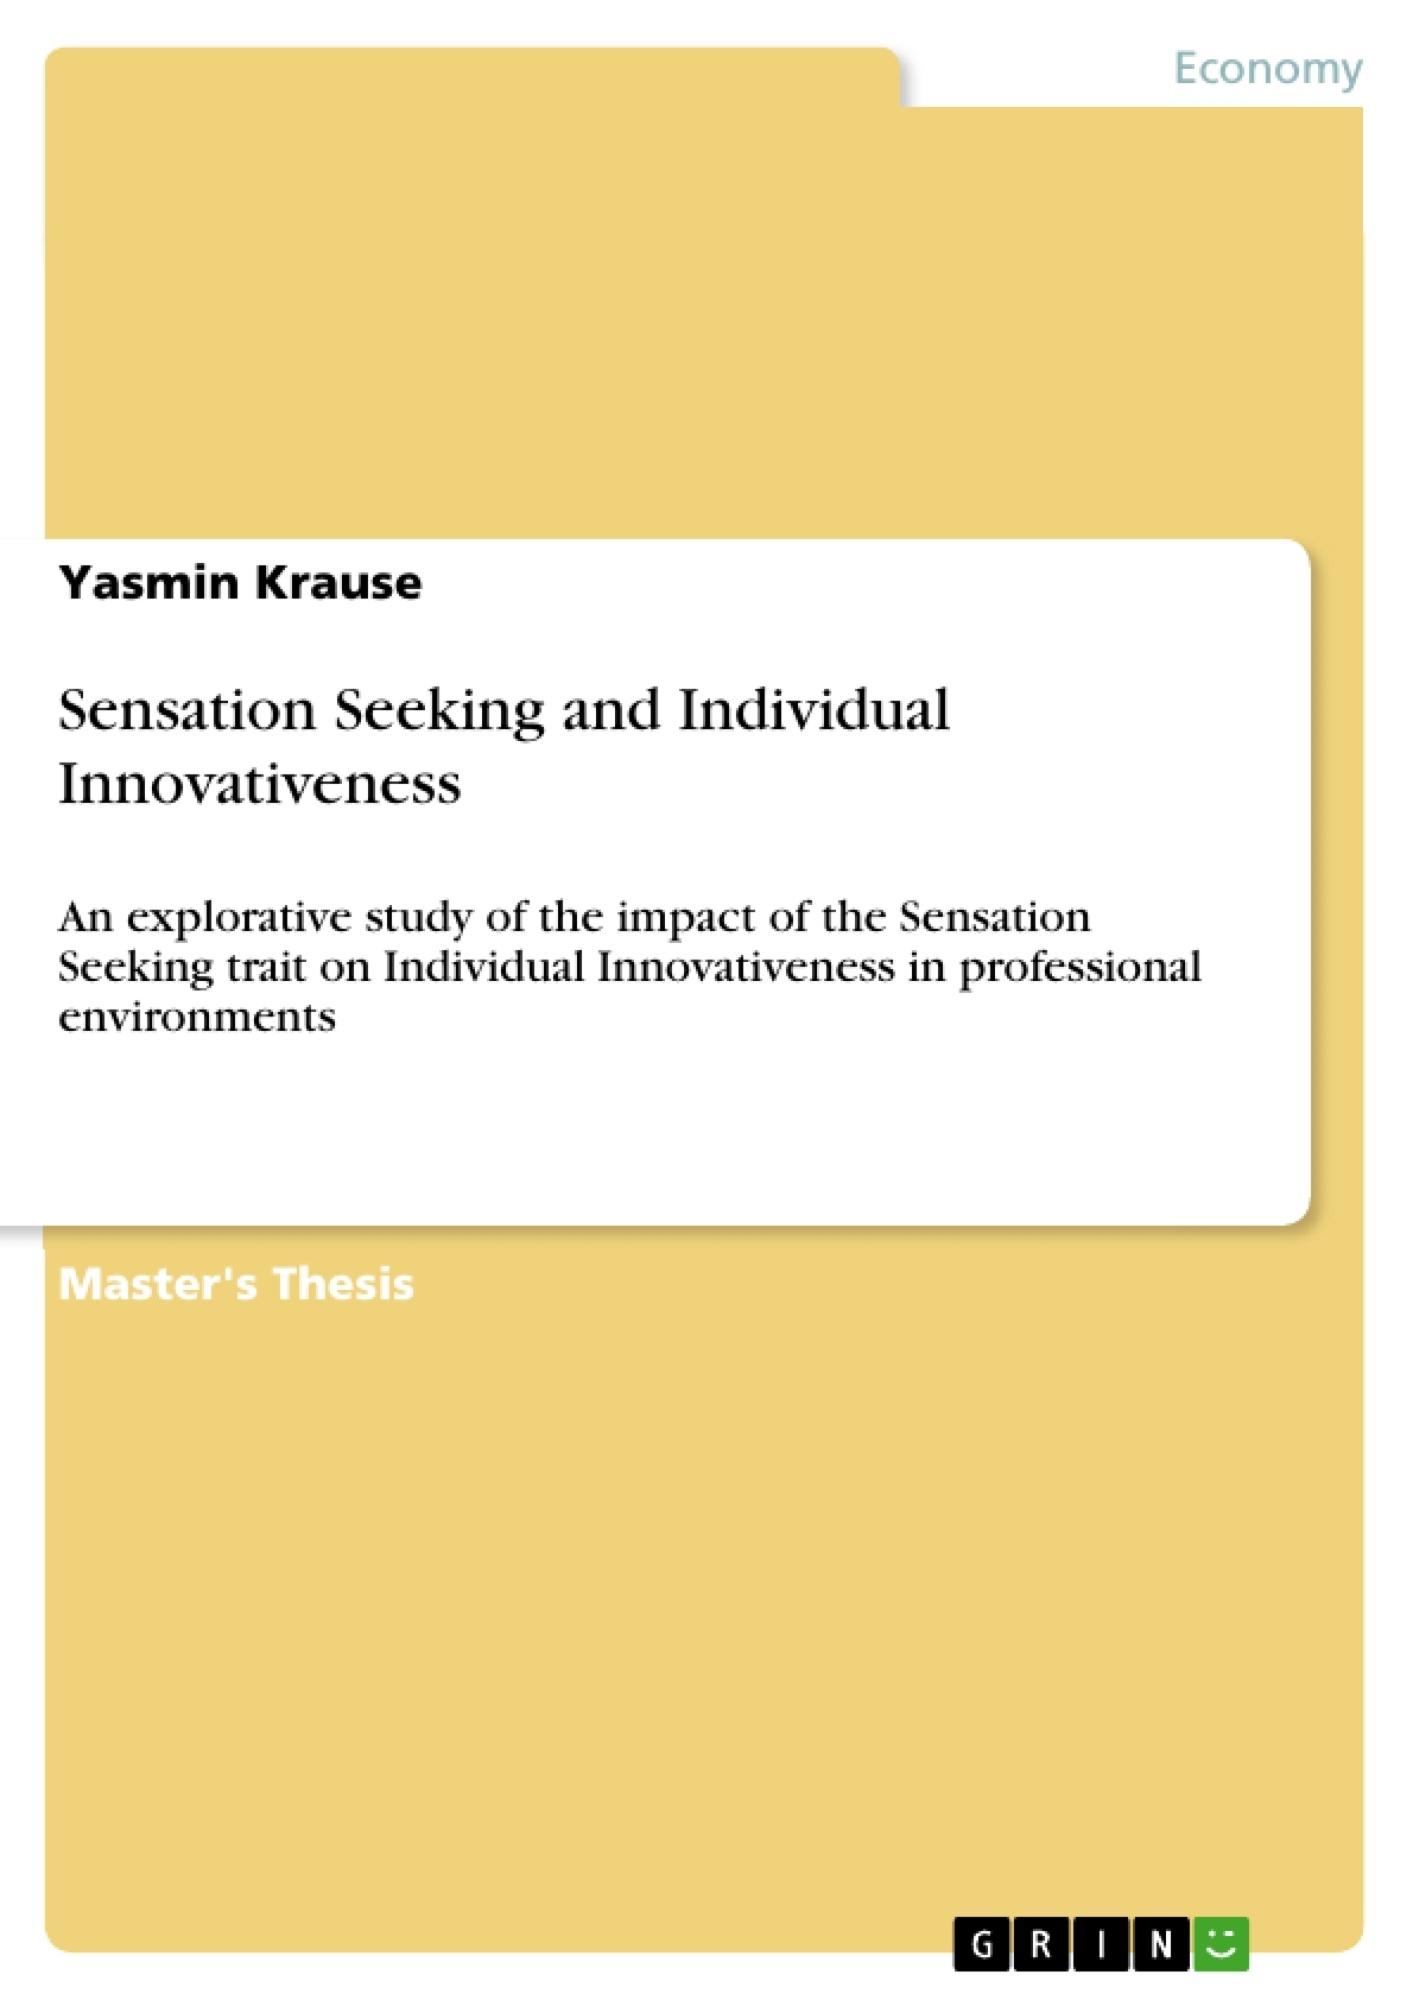 Title: Sensation Seeking and Individual Innovativeness